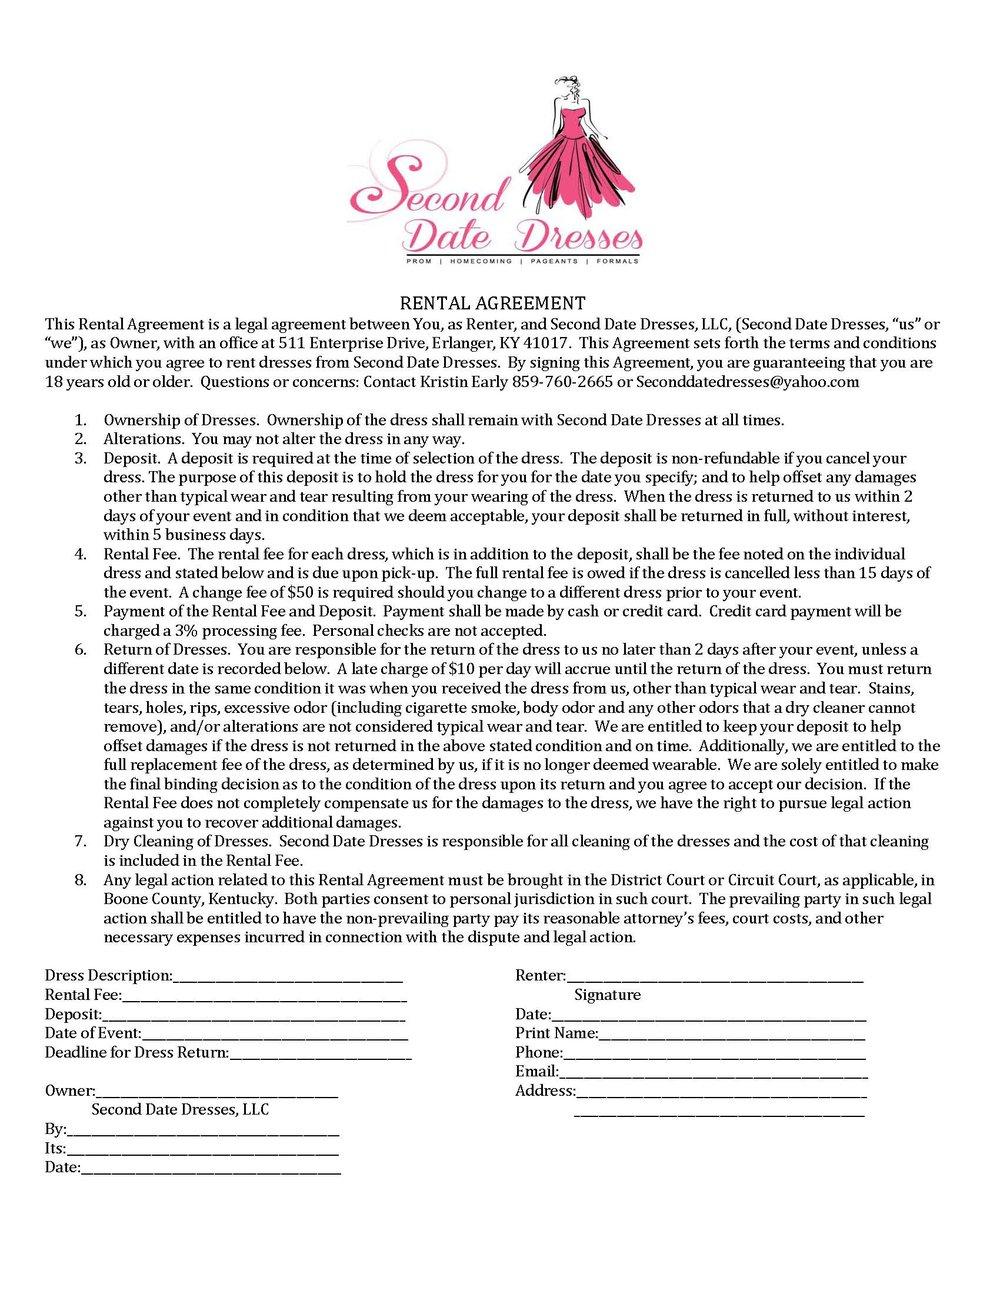 final rental agreement ajpg